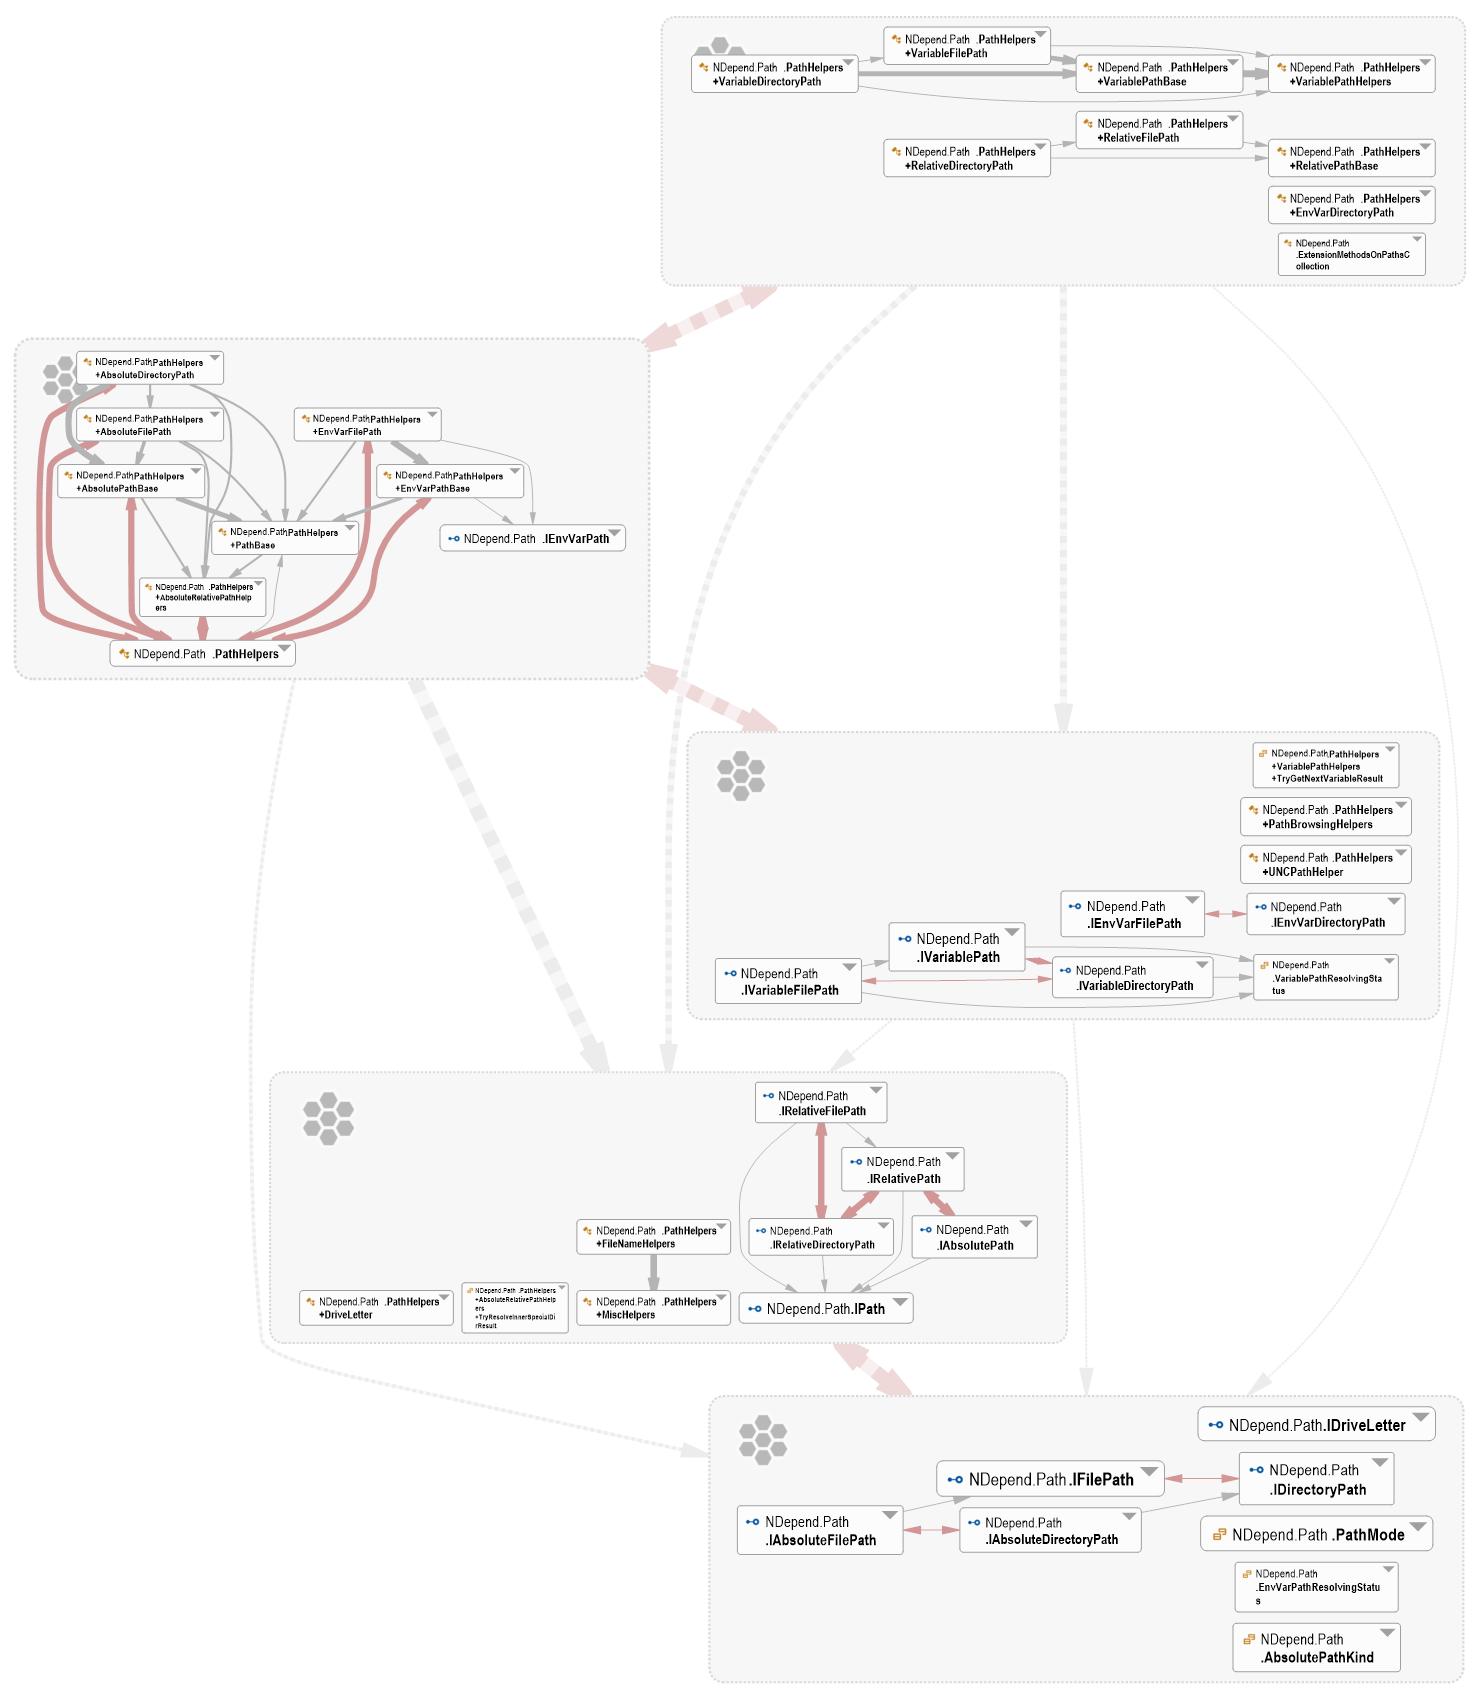 NDepend-Path-Class-Diagram